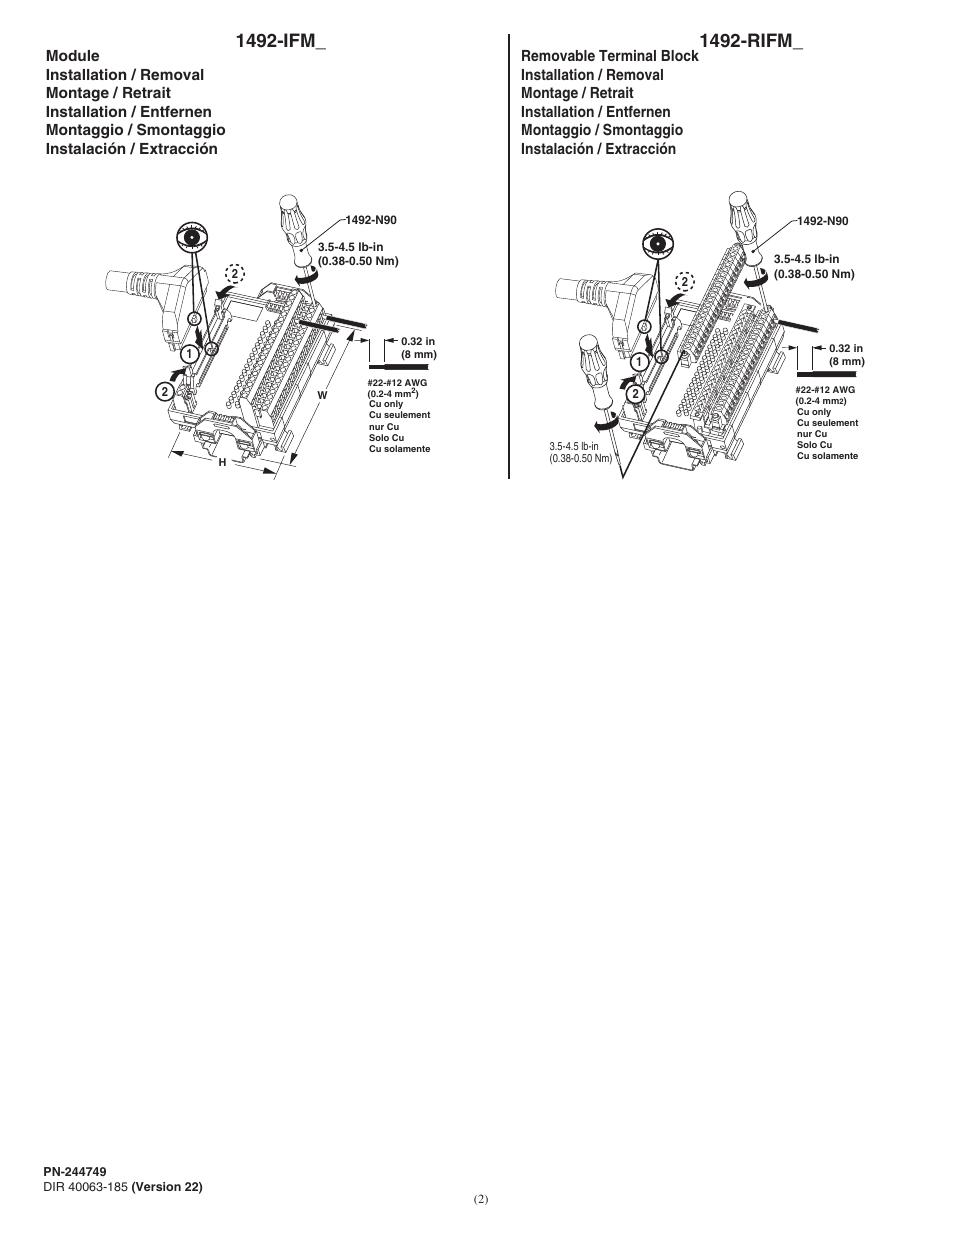 Rockwell Automation 1492-IFMxxxx Sensor Interface Modules